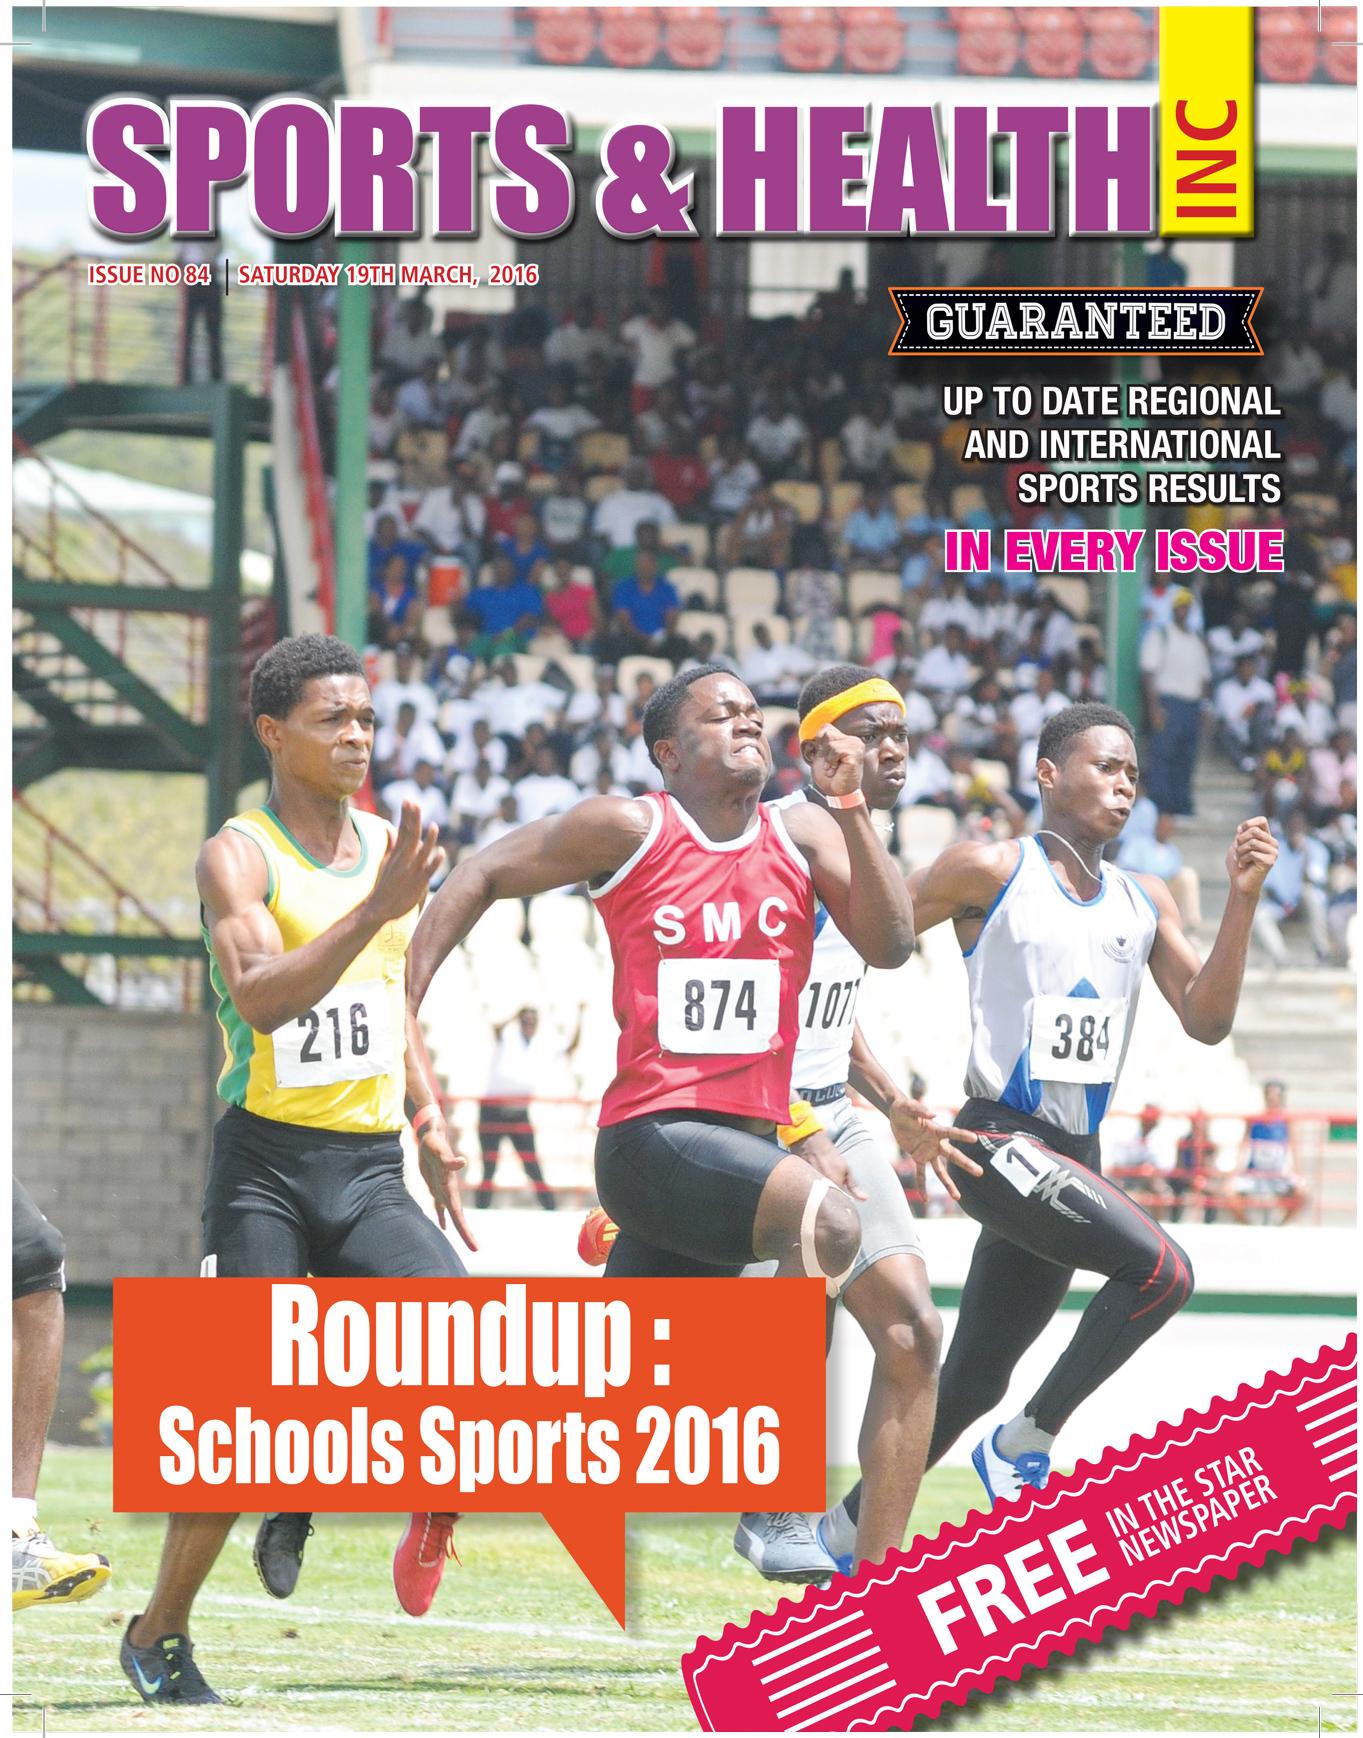 Sports & Health Magazine Inc. Saturday March 19th, 2016 ~ Issue no. 84